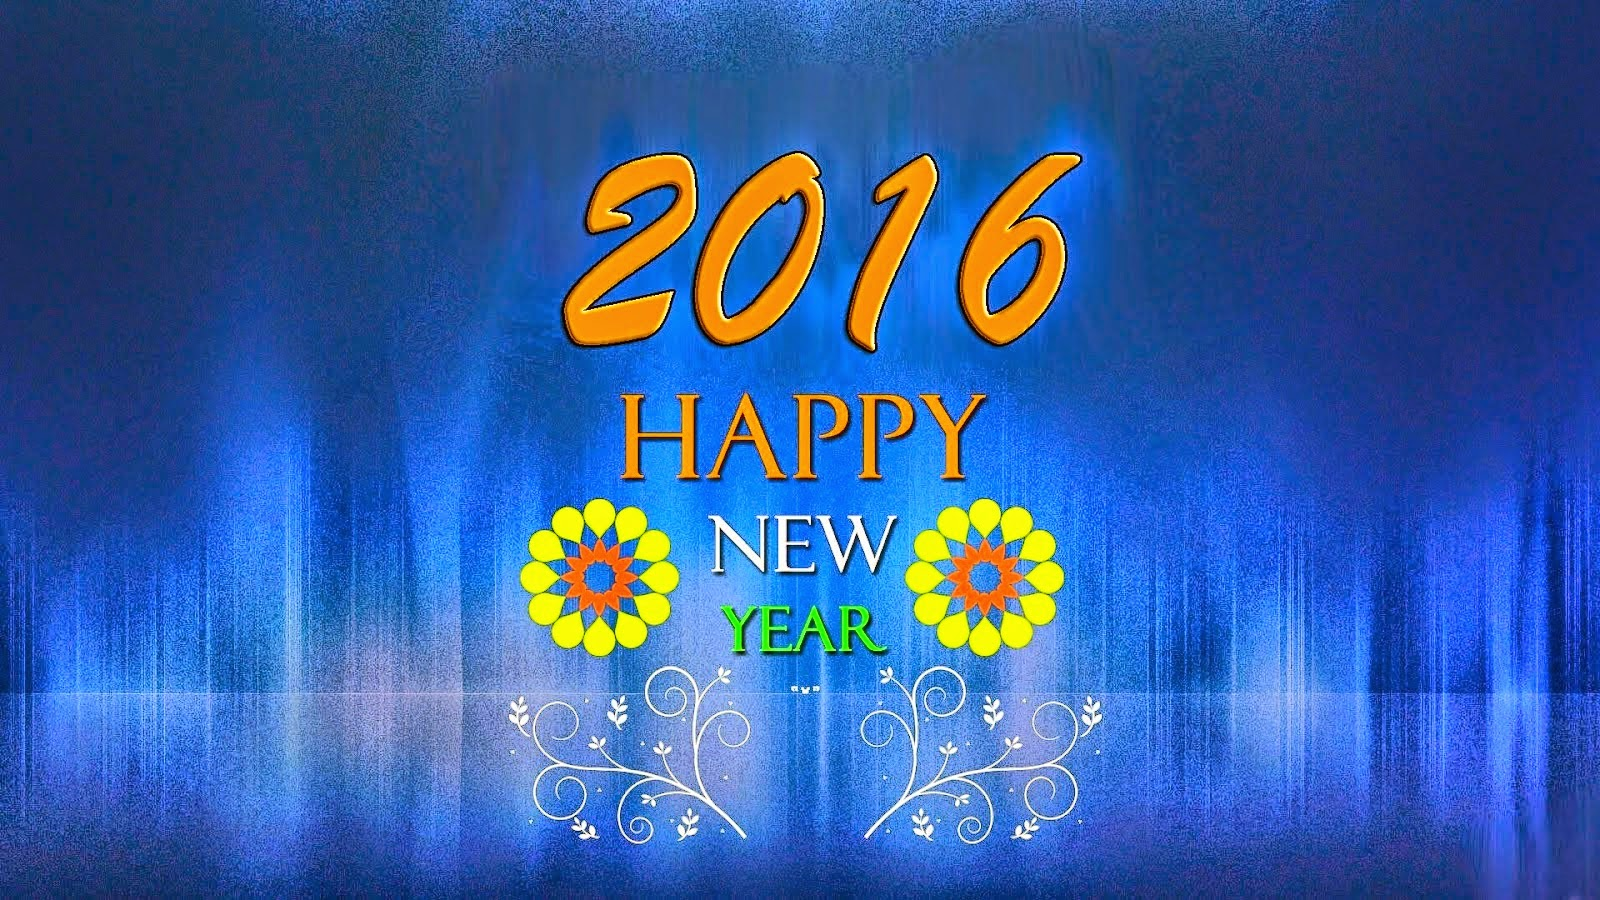 New year greeting cards 3 new year greeting cards hd widescreen wallpaper kristyandbryce Choice Image